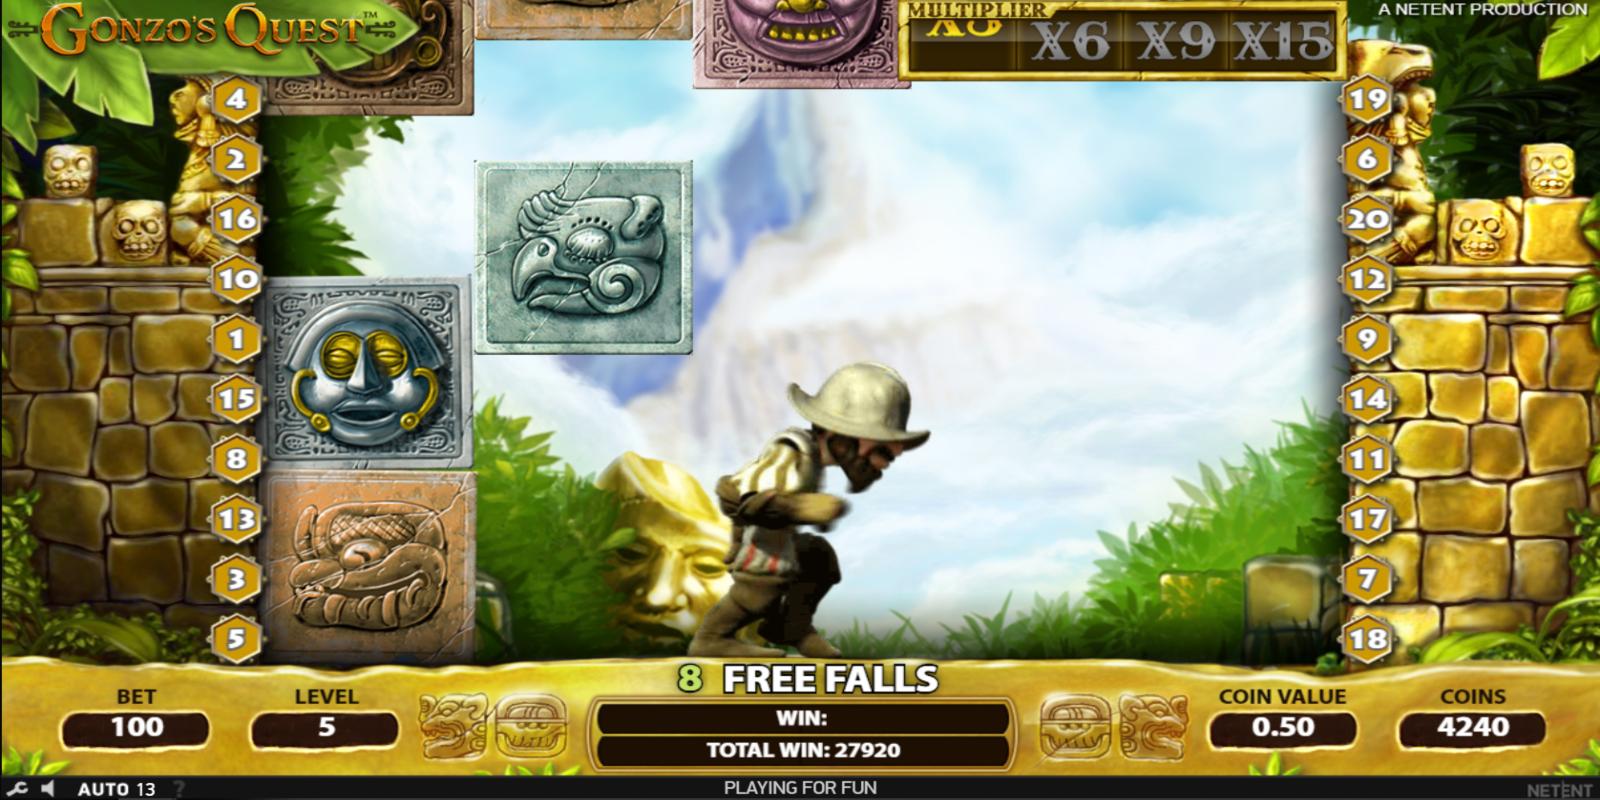 Gonzo's quest Free Falls bonuss - 10 bezmaksas gājienus (free spins)